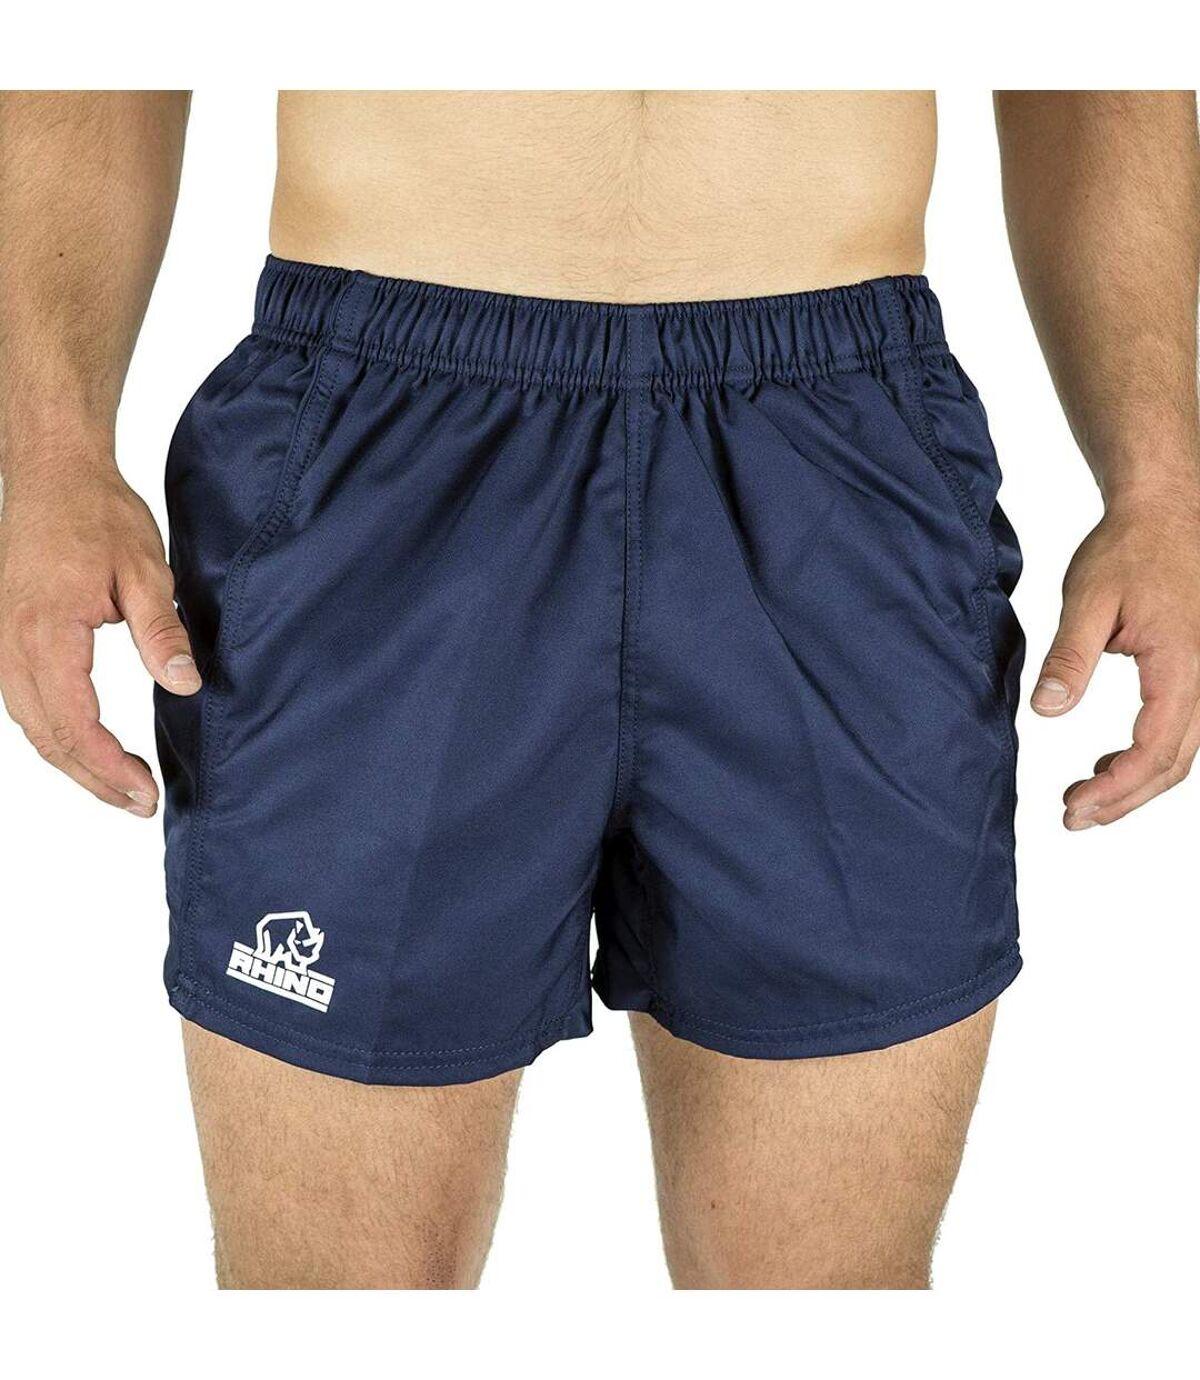 Rhino Mens Auckland Rugby Shorts (Navy) - UTRW6465